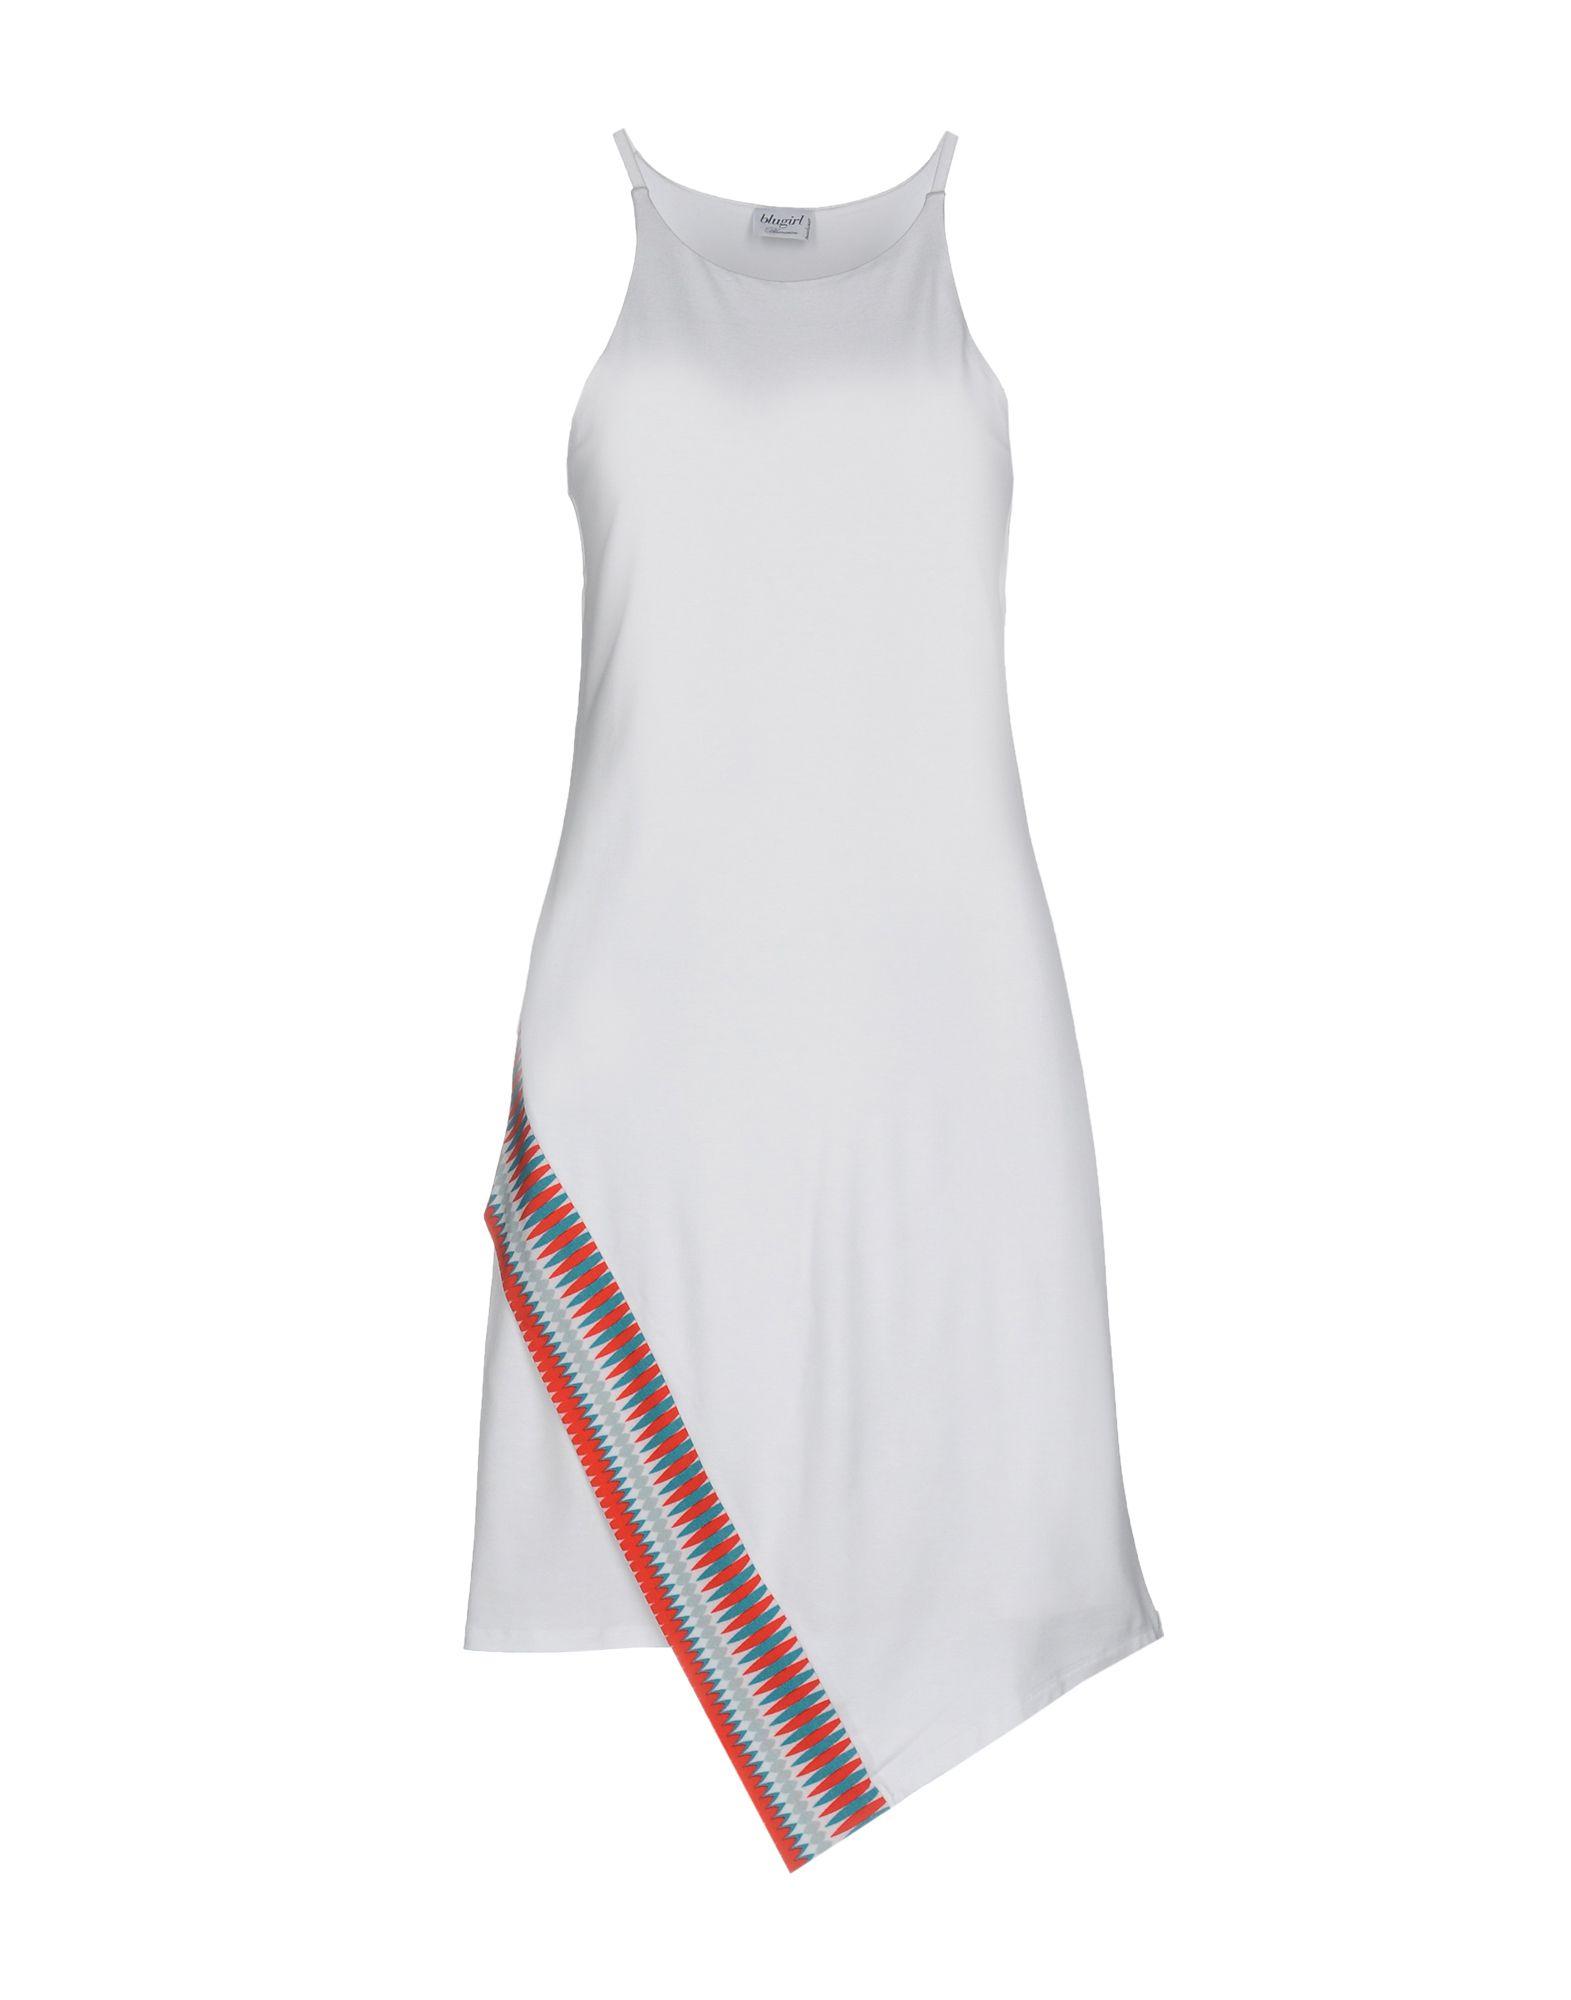 BLUGIRL BLUMARINE BEACHWEAR Короткое платье blugirl blumarine beachwear слитный купальник